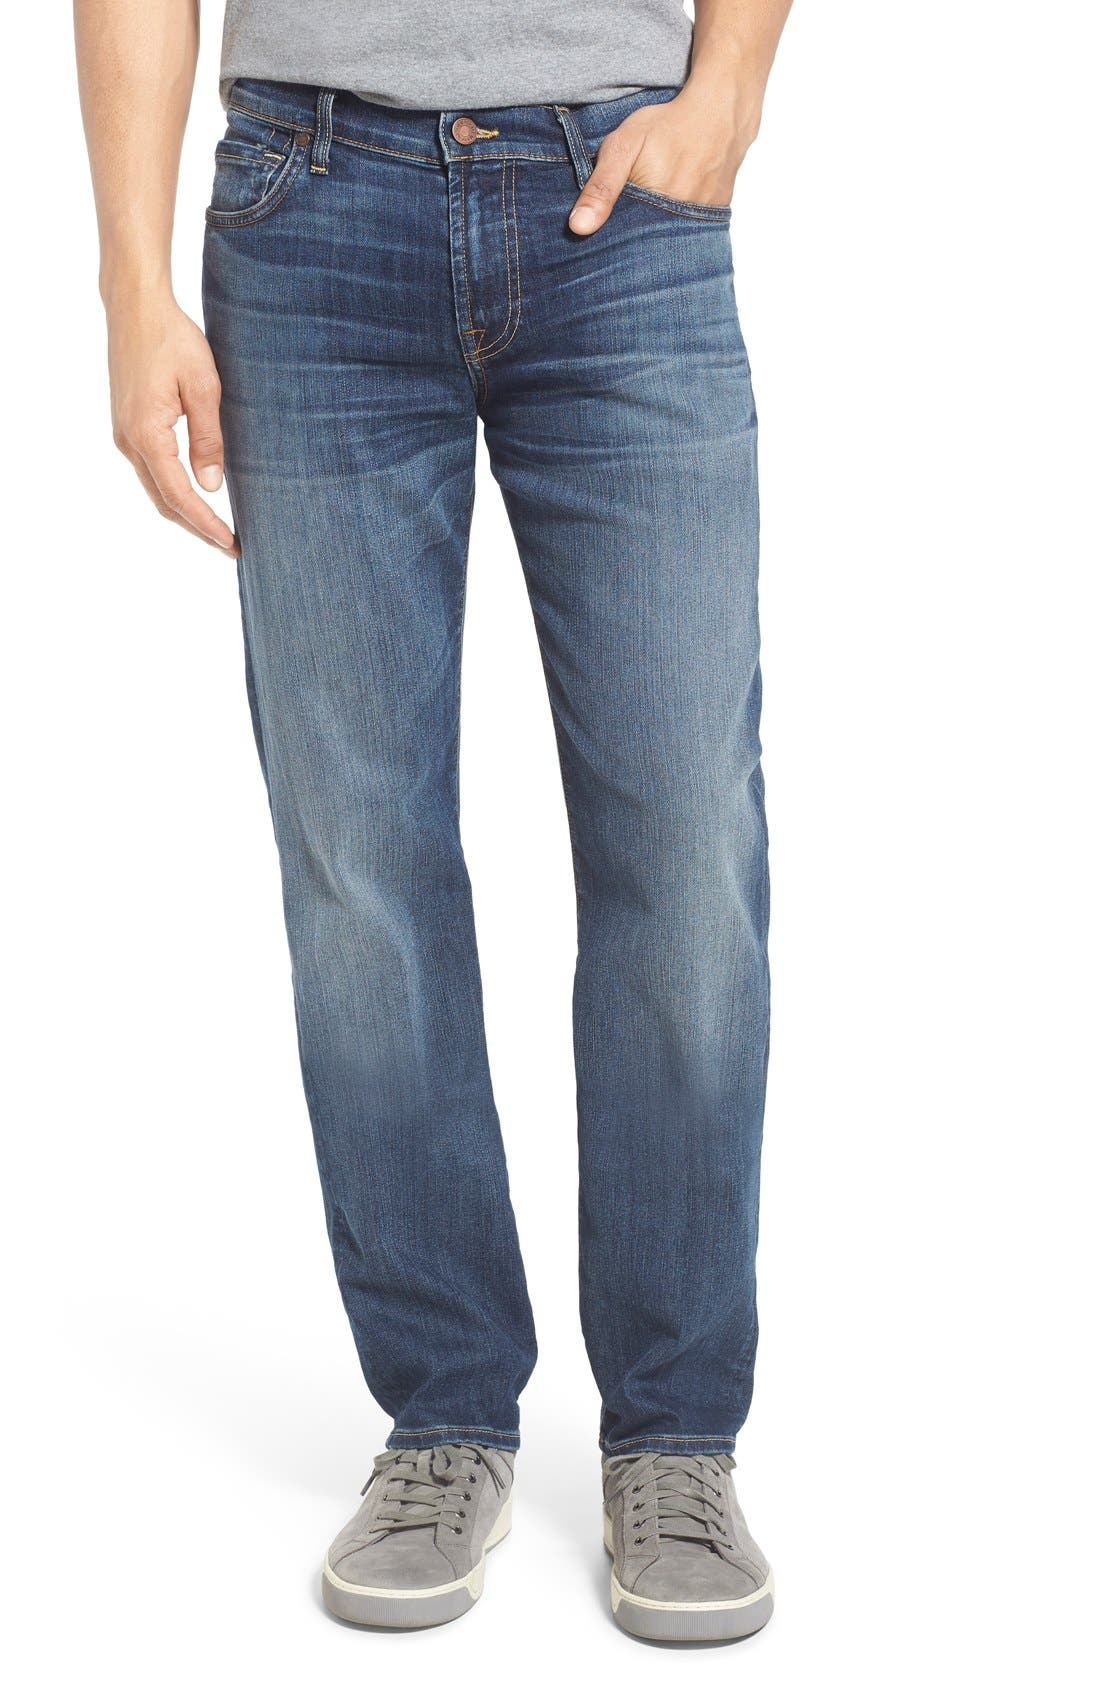 Slimmy Airweft Slim Fit Jeans,                         Main,                         color, Air Weft Riptide